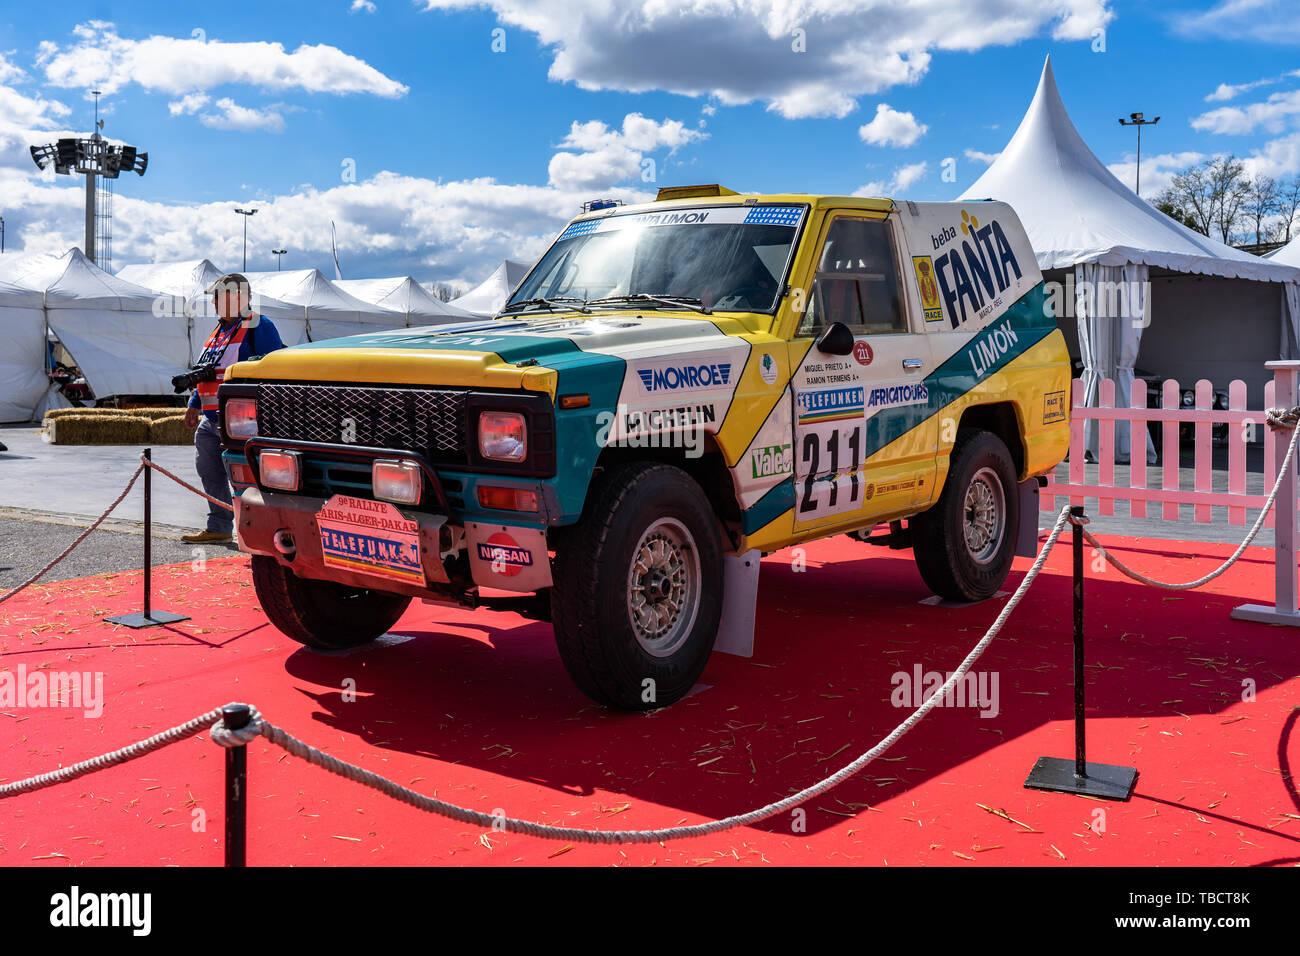 Nissan Patrol Stock Photos & Nissan Patrol Stock Images - Alamy